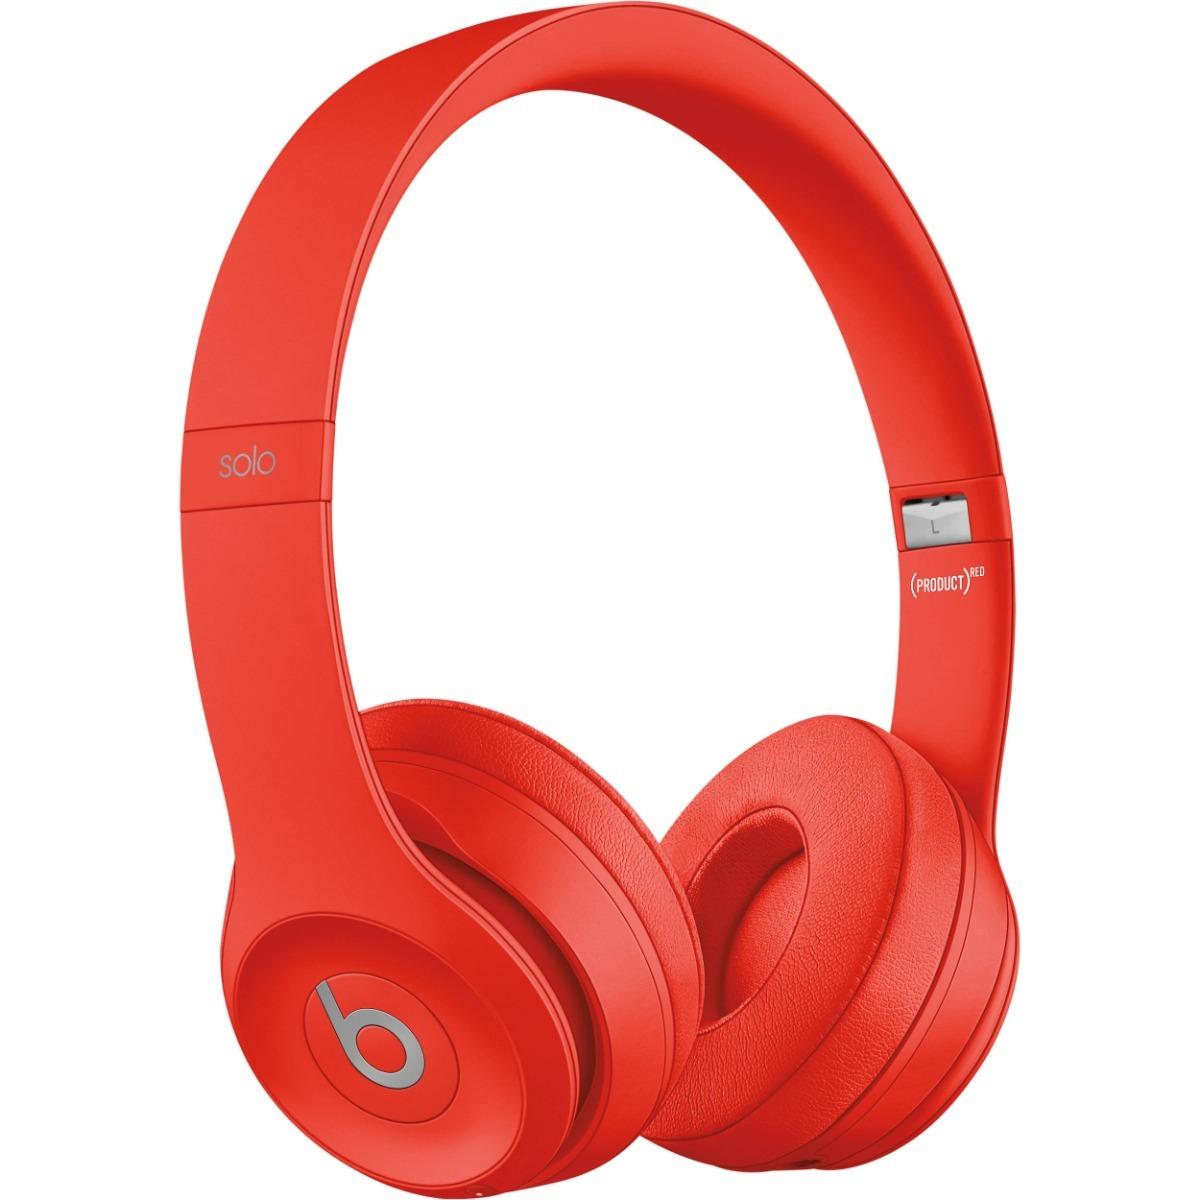 72280070b7a Audífonos Inalámbricos Beats Solo3 Wireless - Rojo - $ 6,299.00 en ...